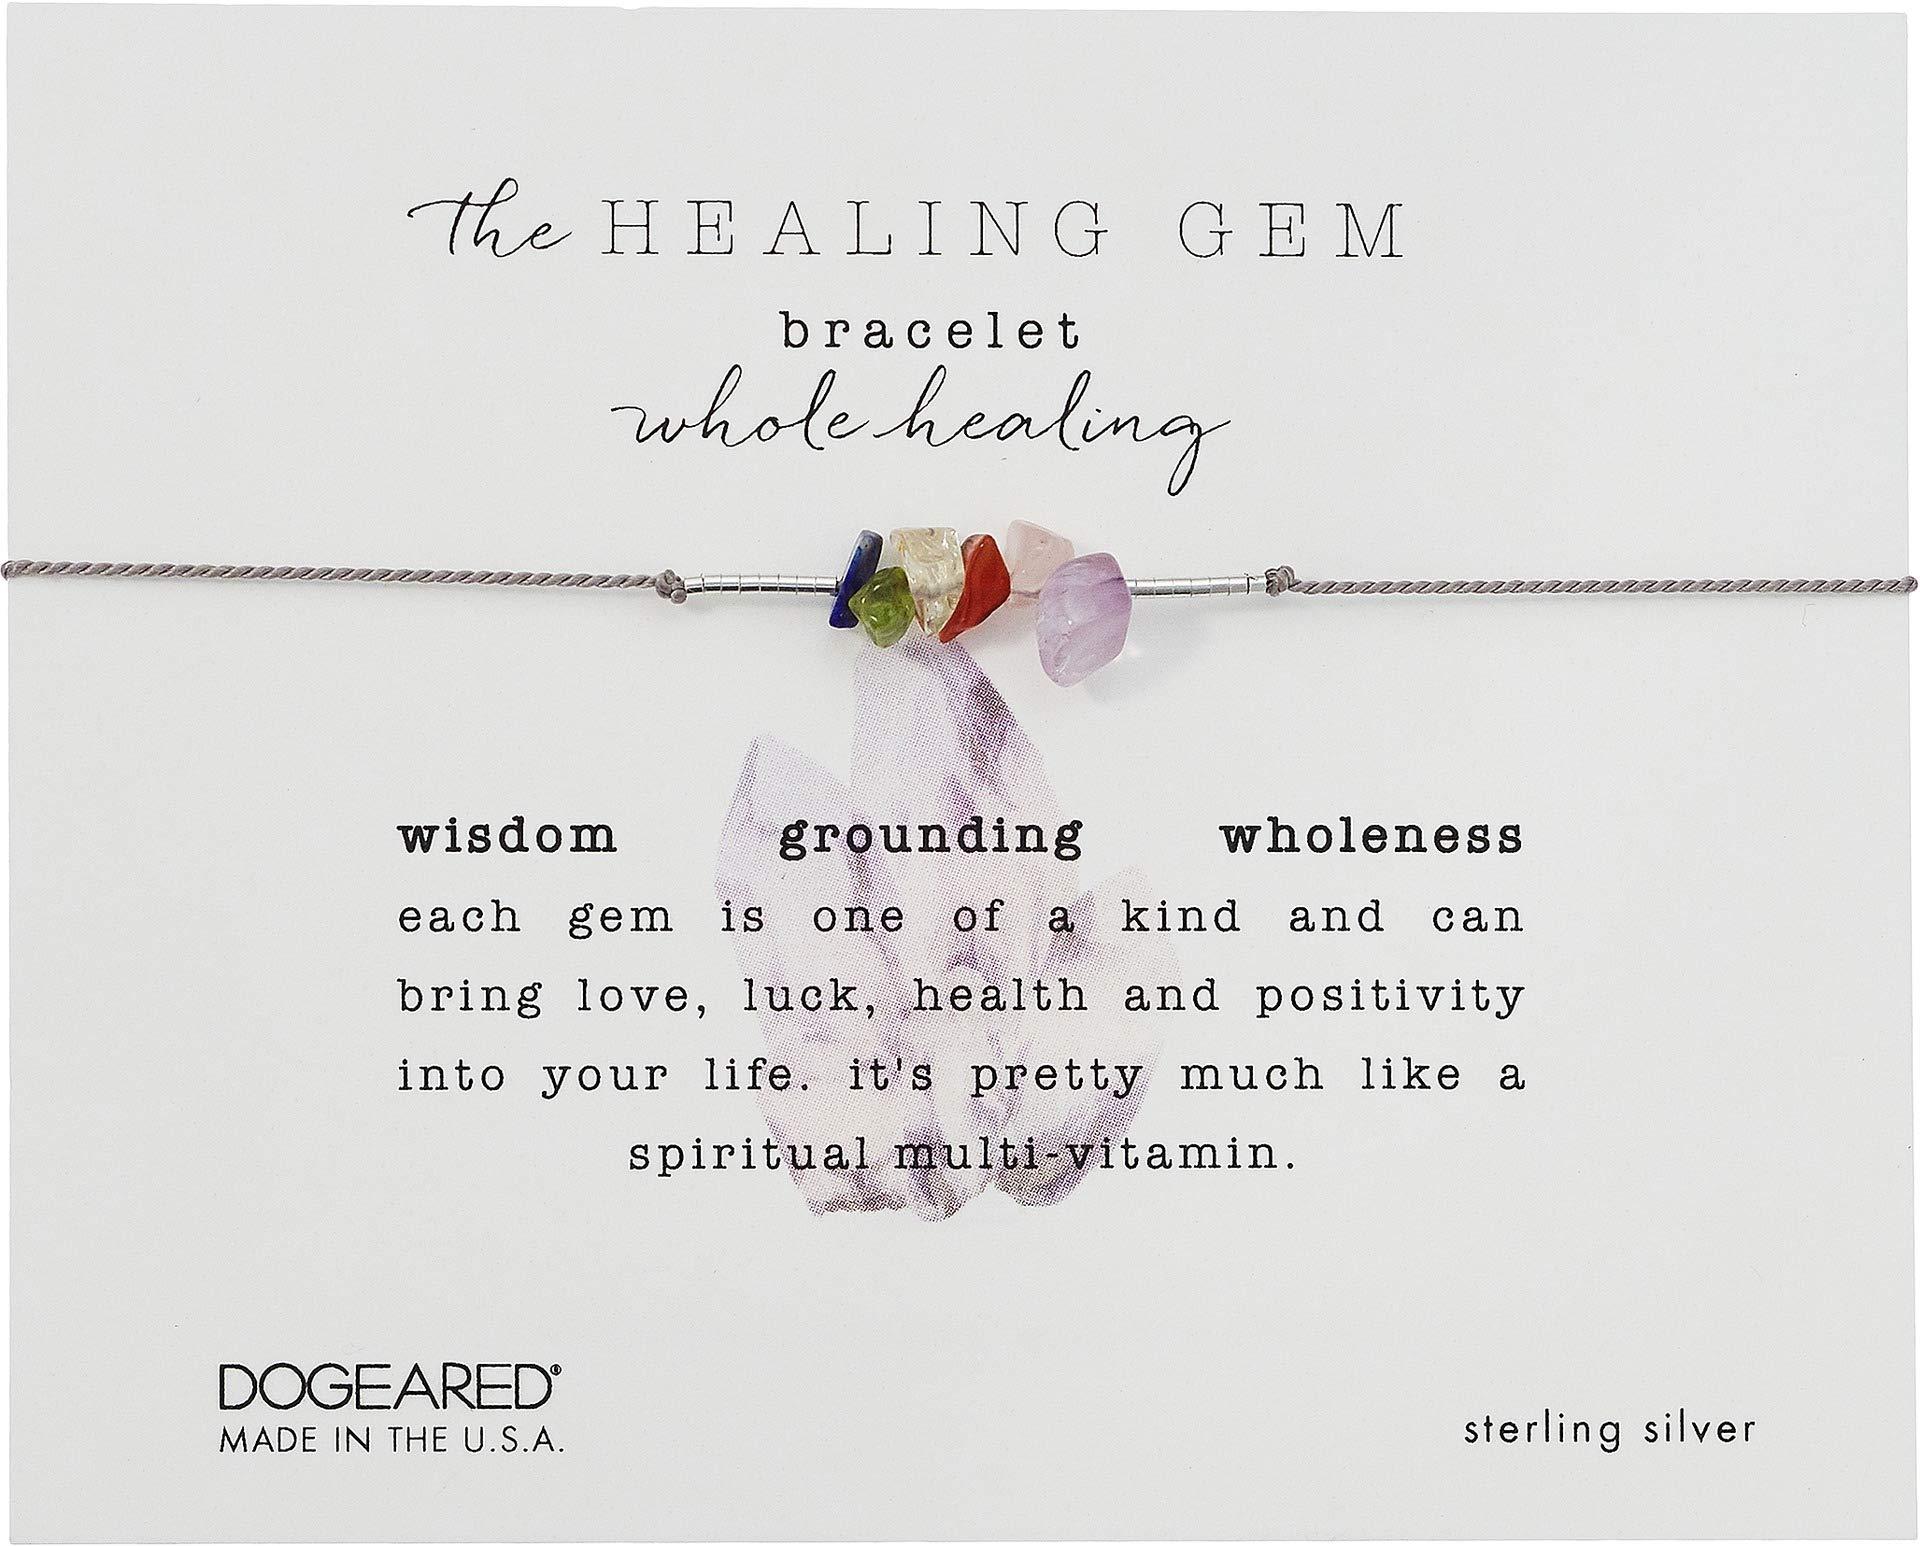 Dogeared Women's The Healing Gem Bracelet, Whole Healing Gems On Silk w/Accent Beads Silver/Grey One Size